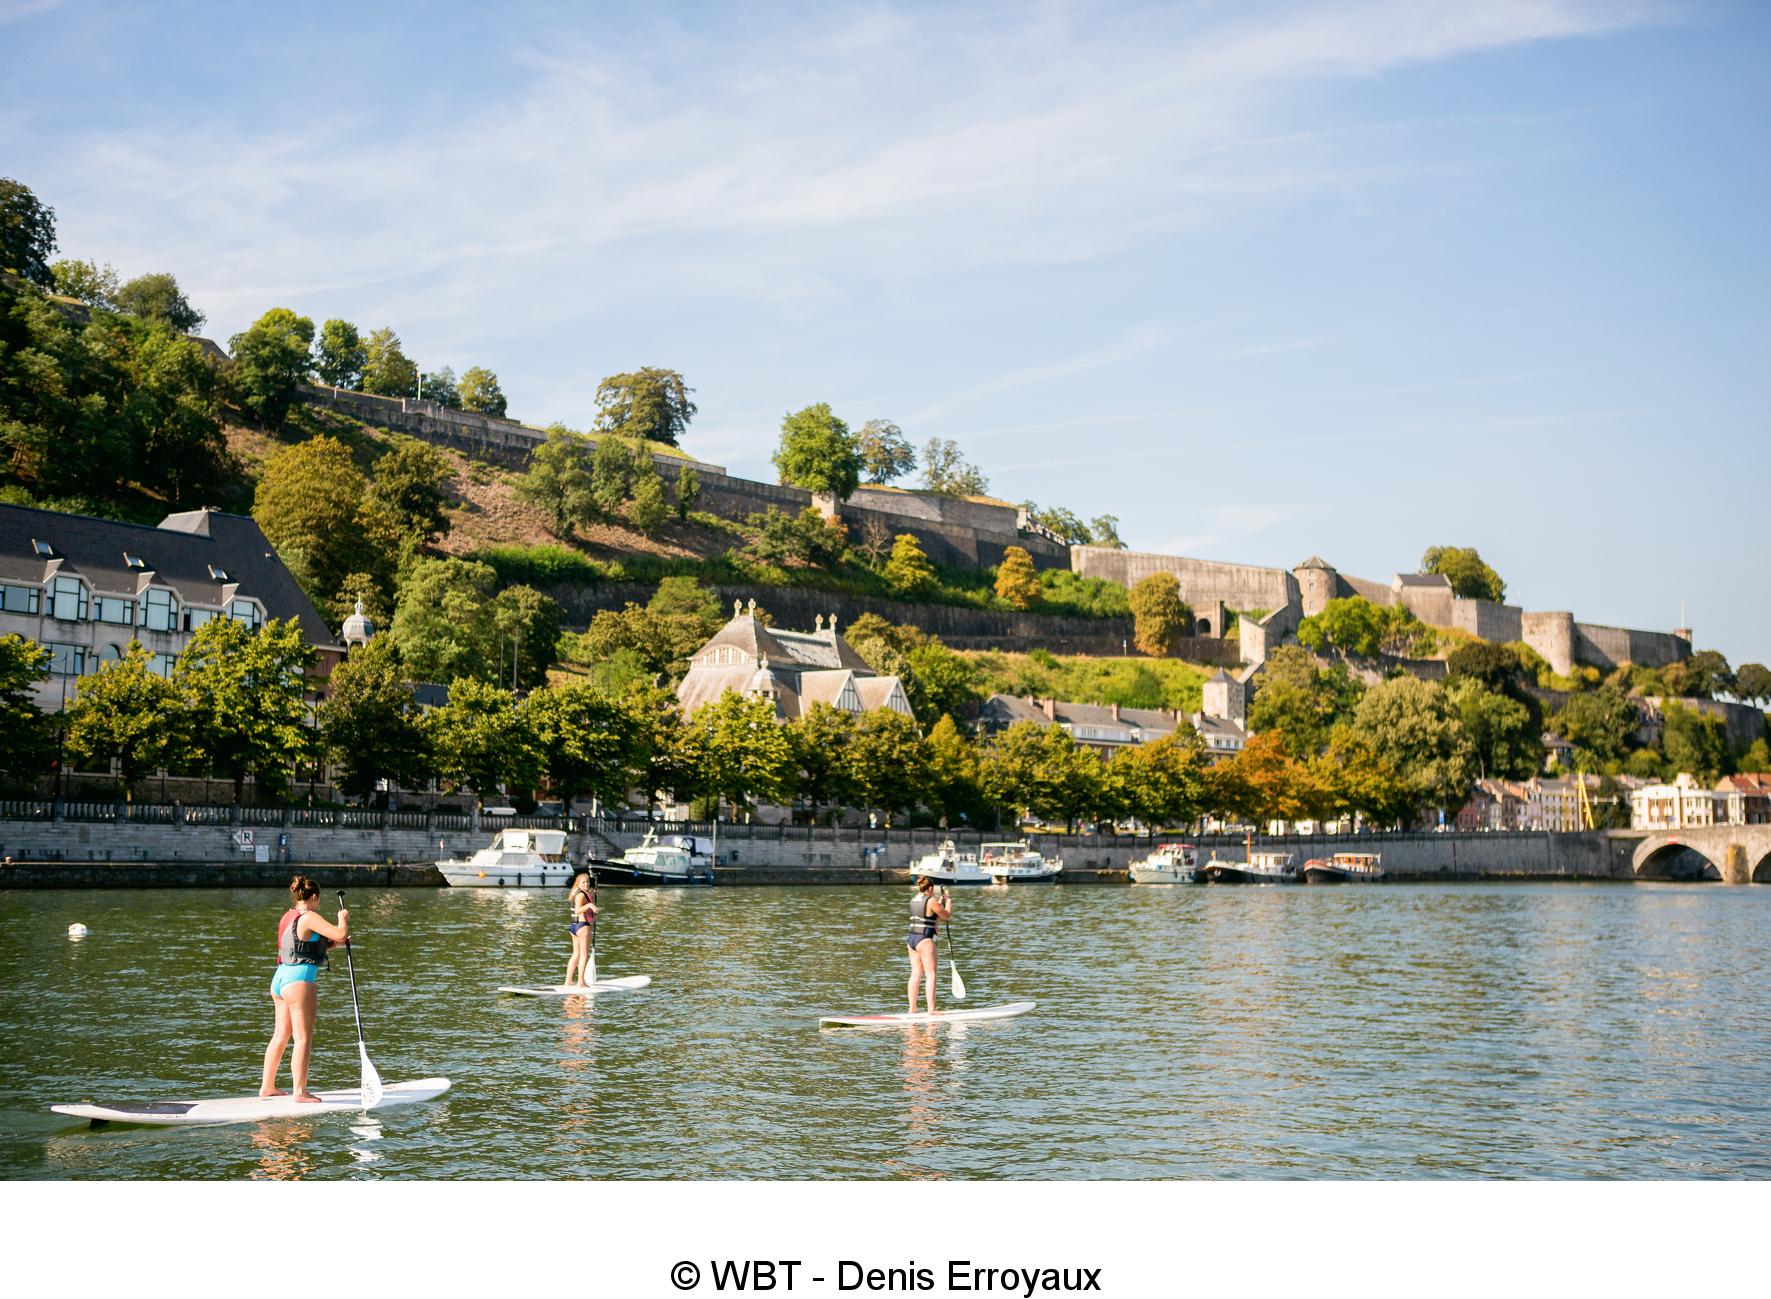 244352_Jambes-Namur-CharliesCapitainerie-Pont-Citadelle_(c)WBT-DenisErroyaux